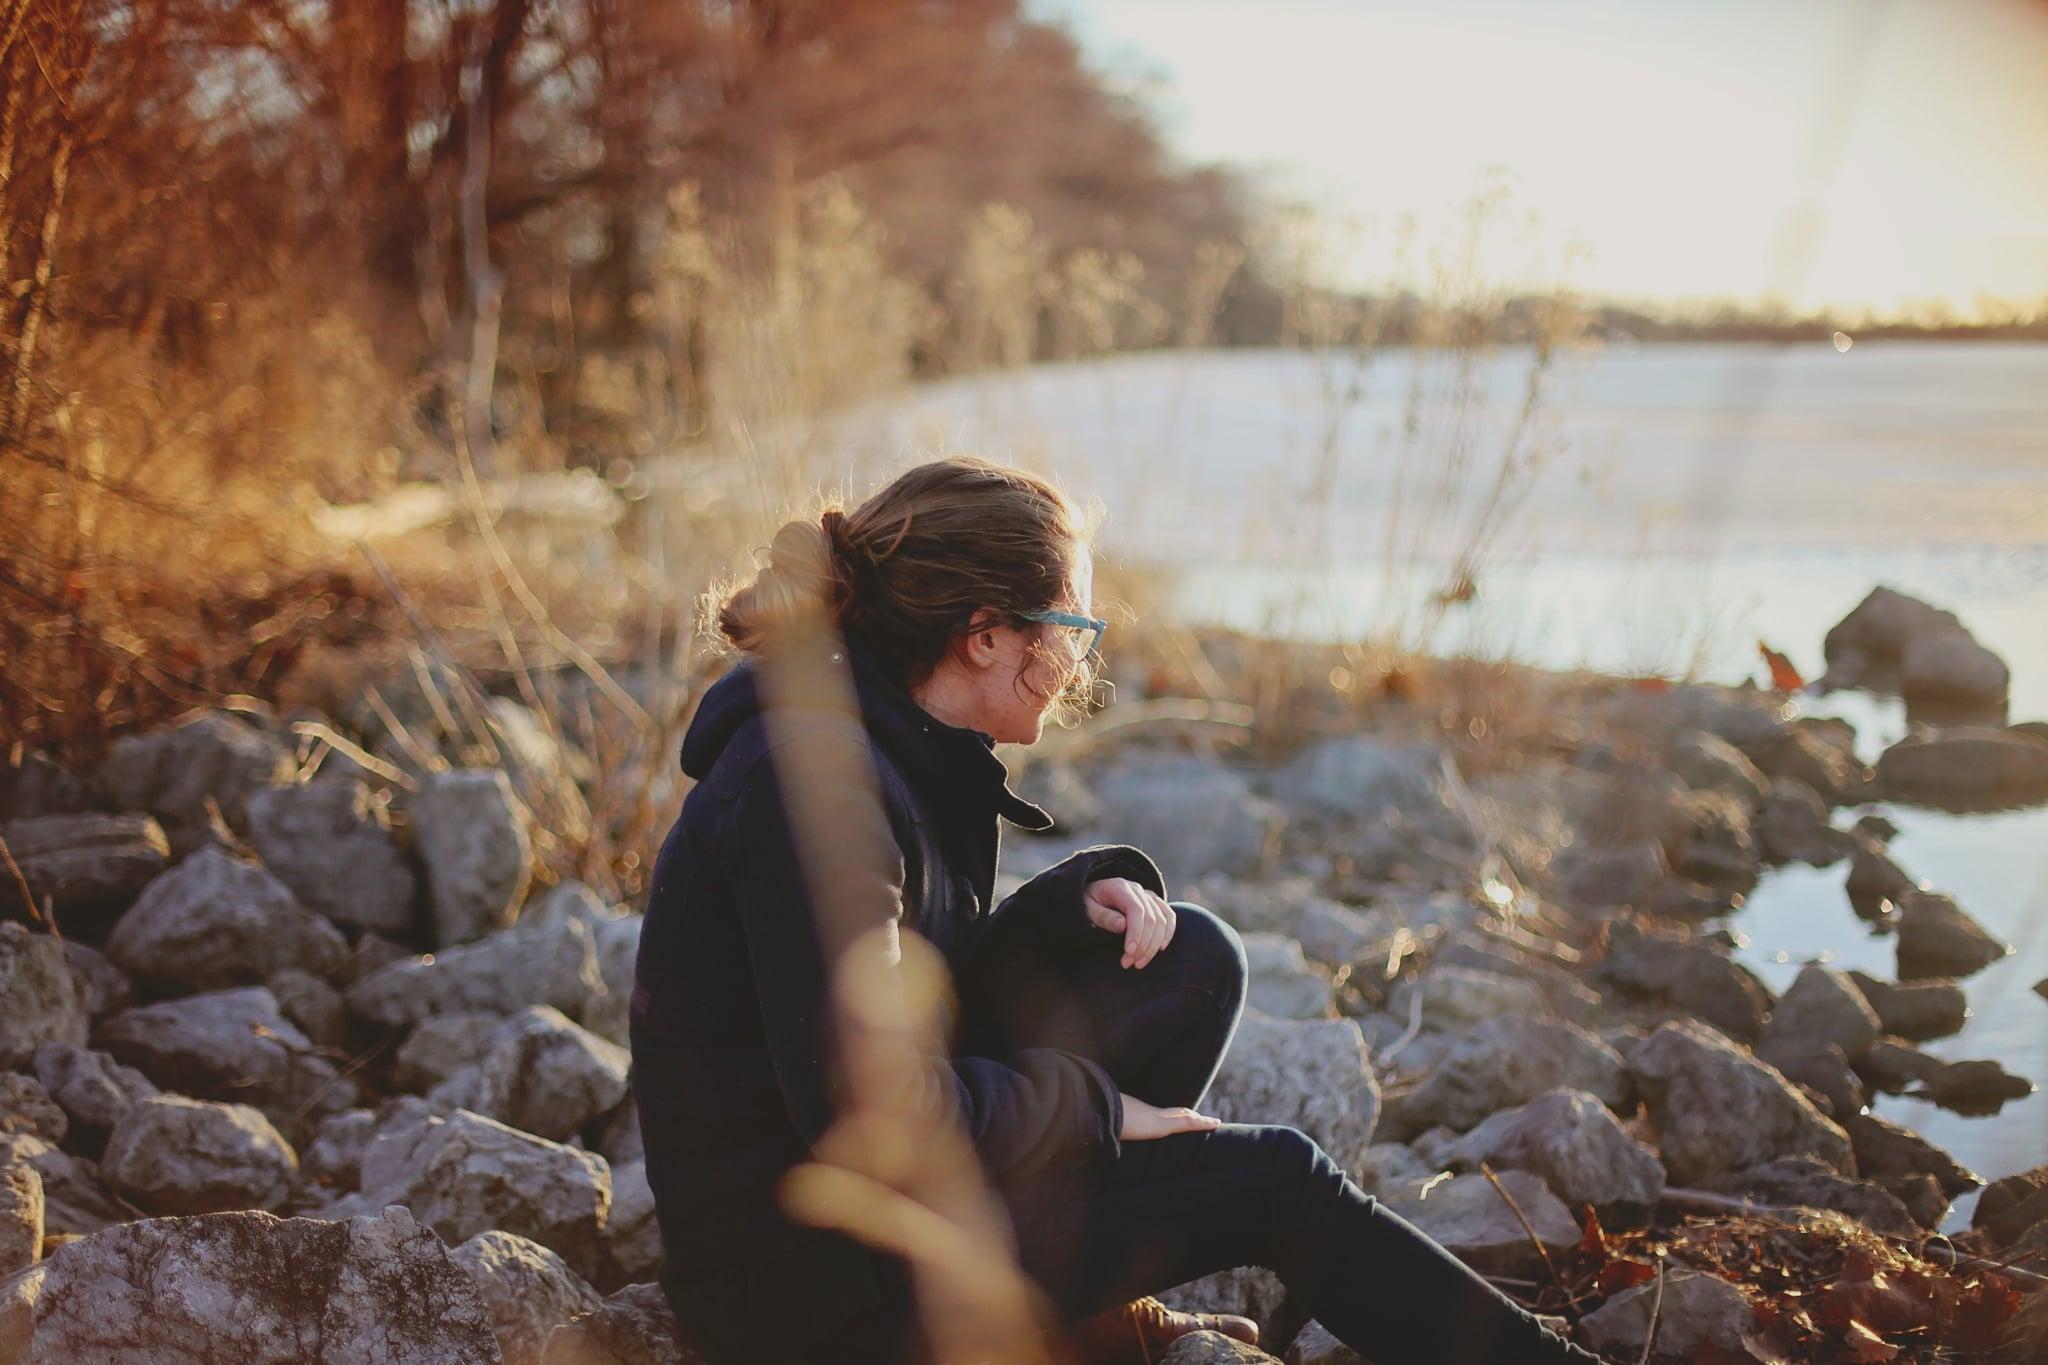 adult alone autumn